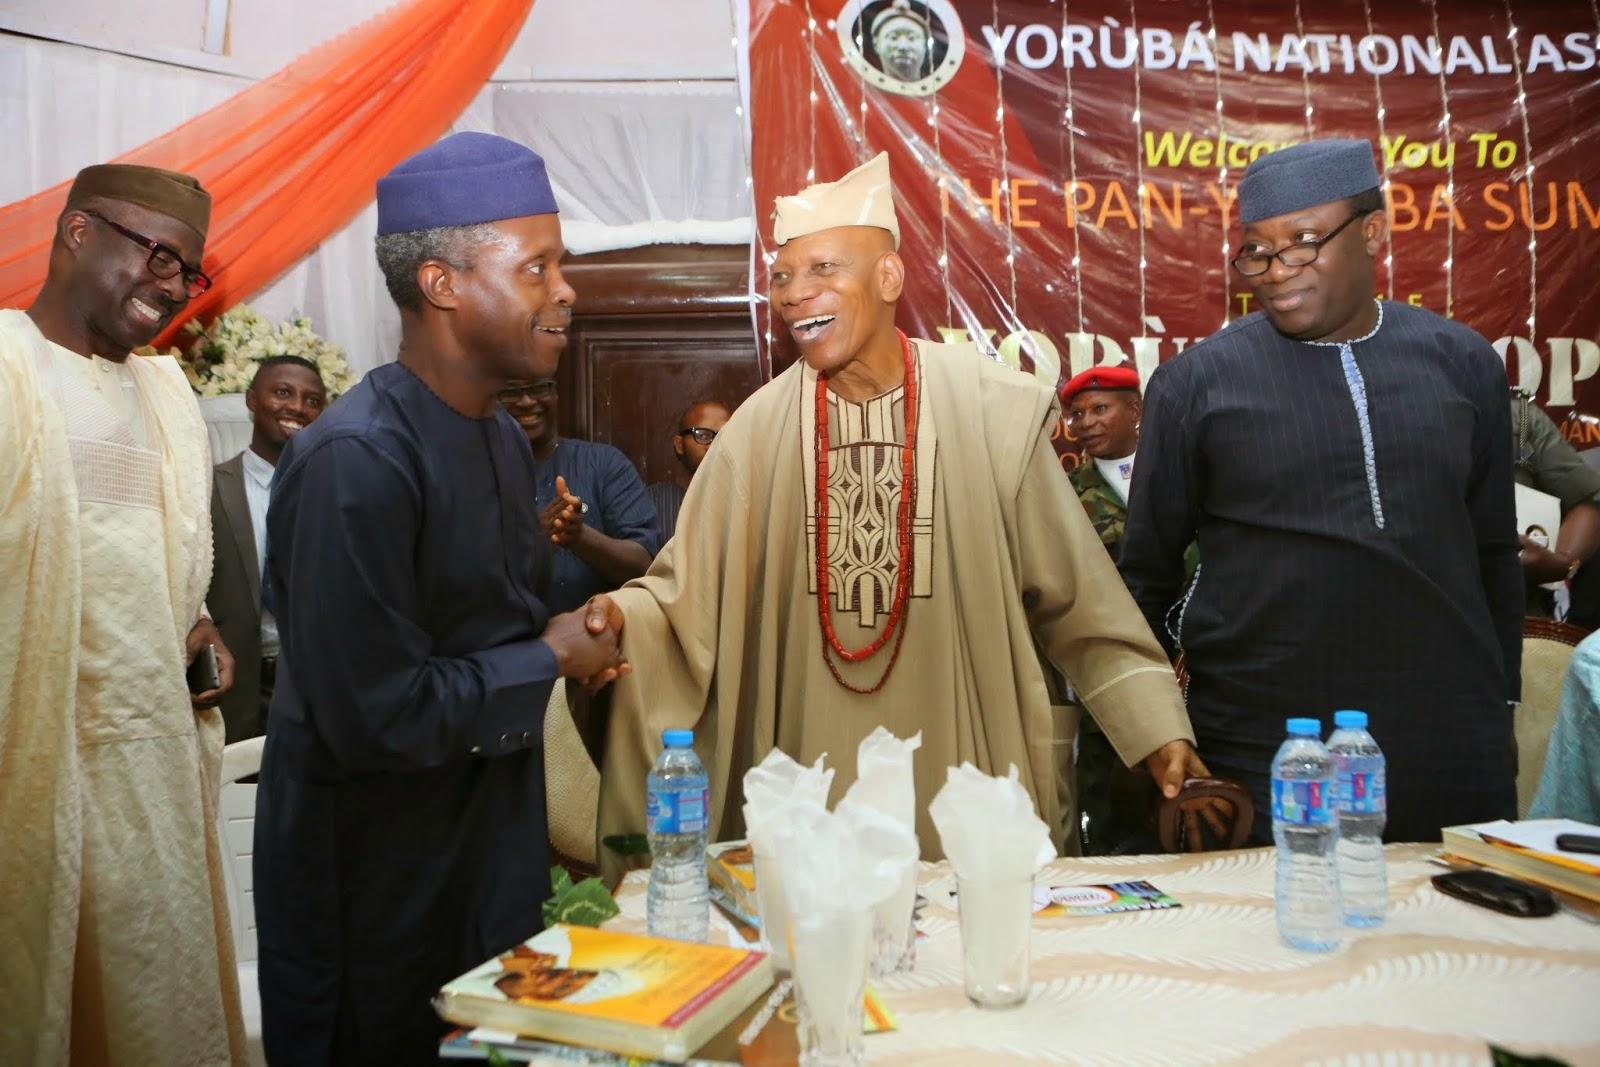 yoruba suffer buhari administration